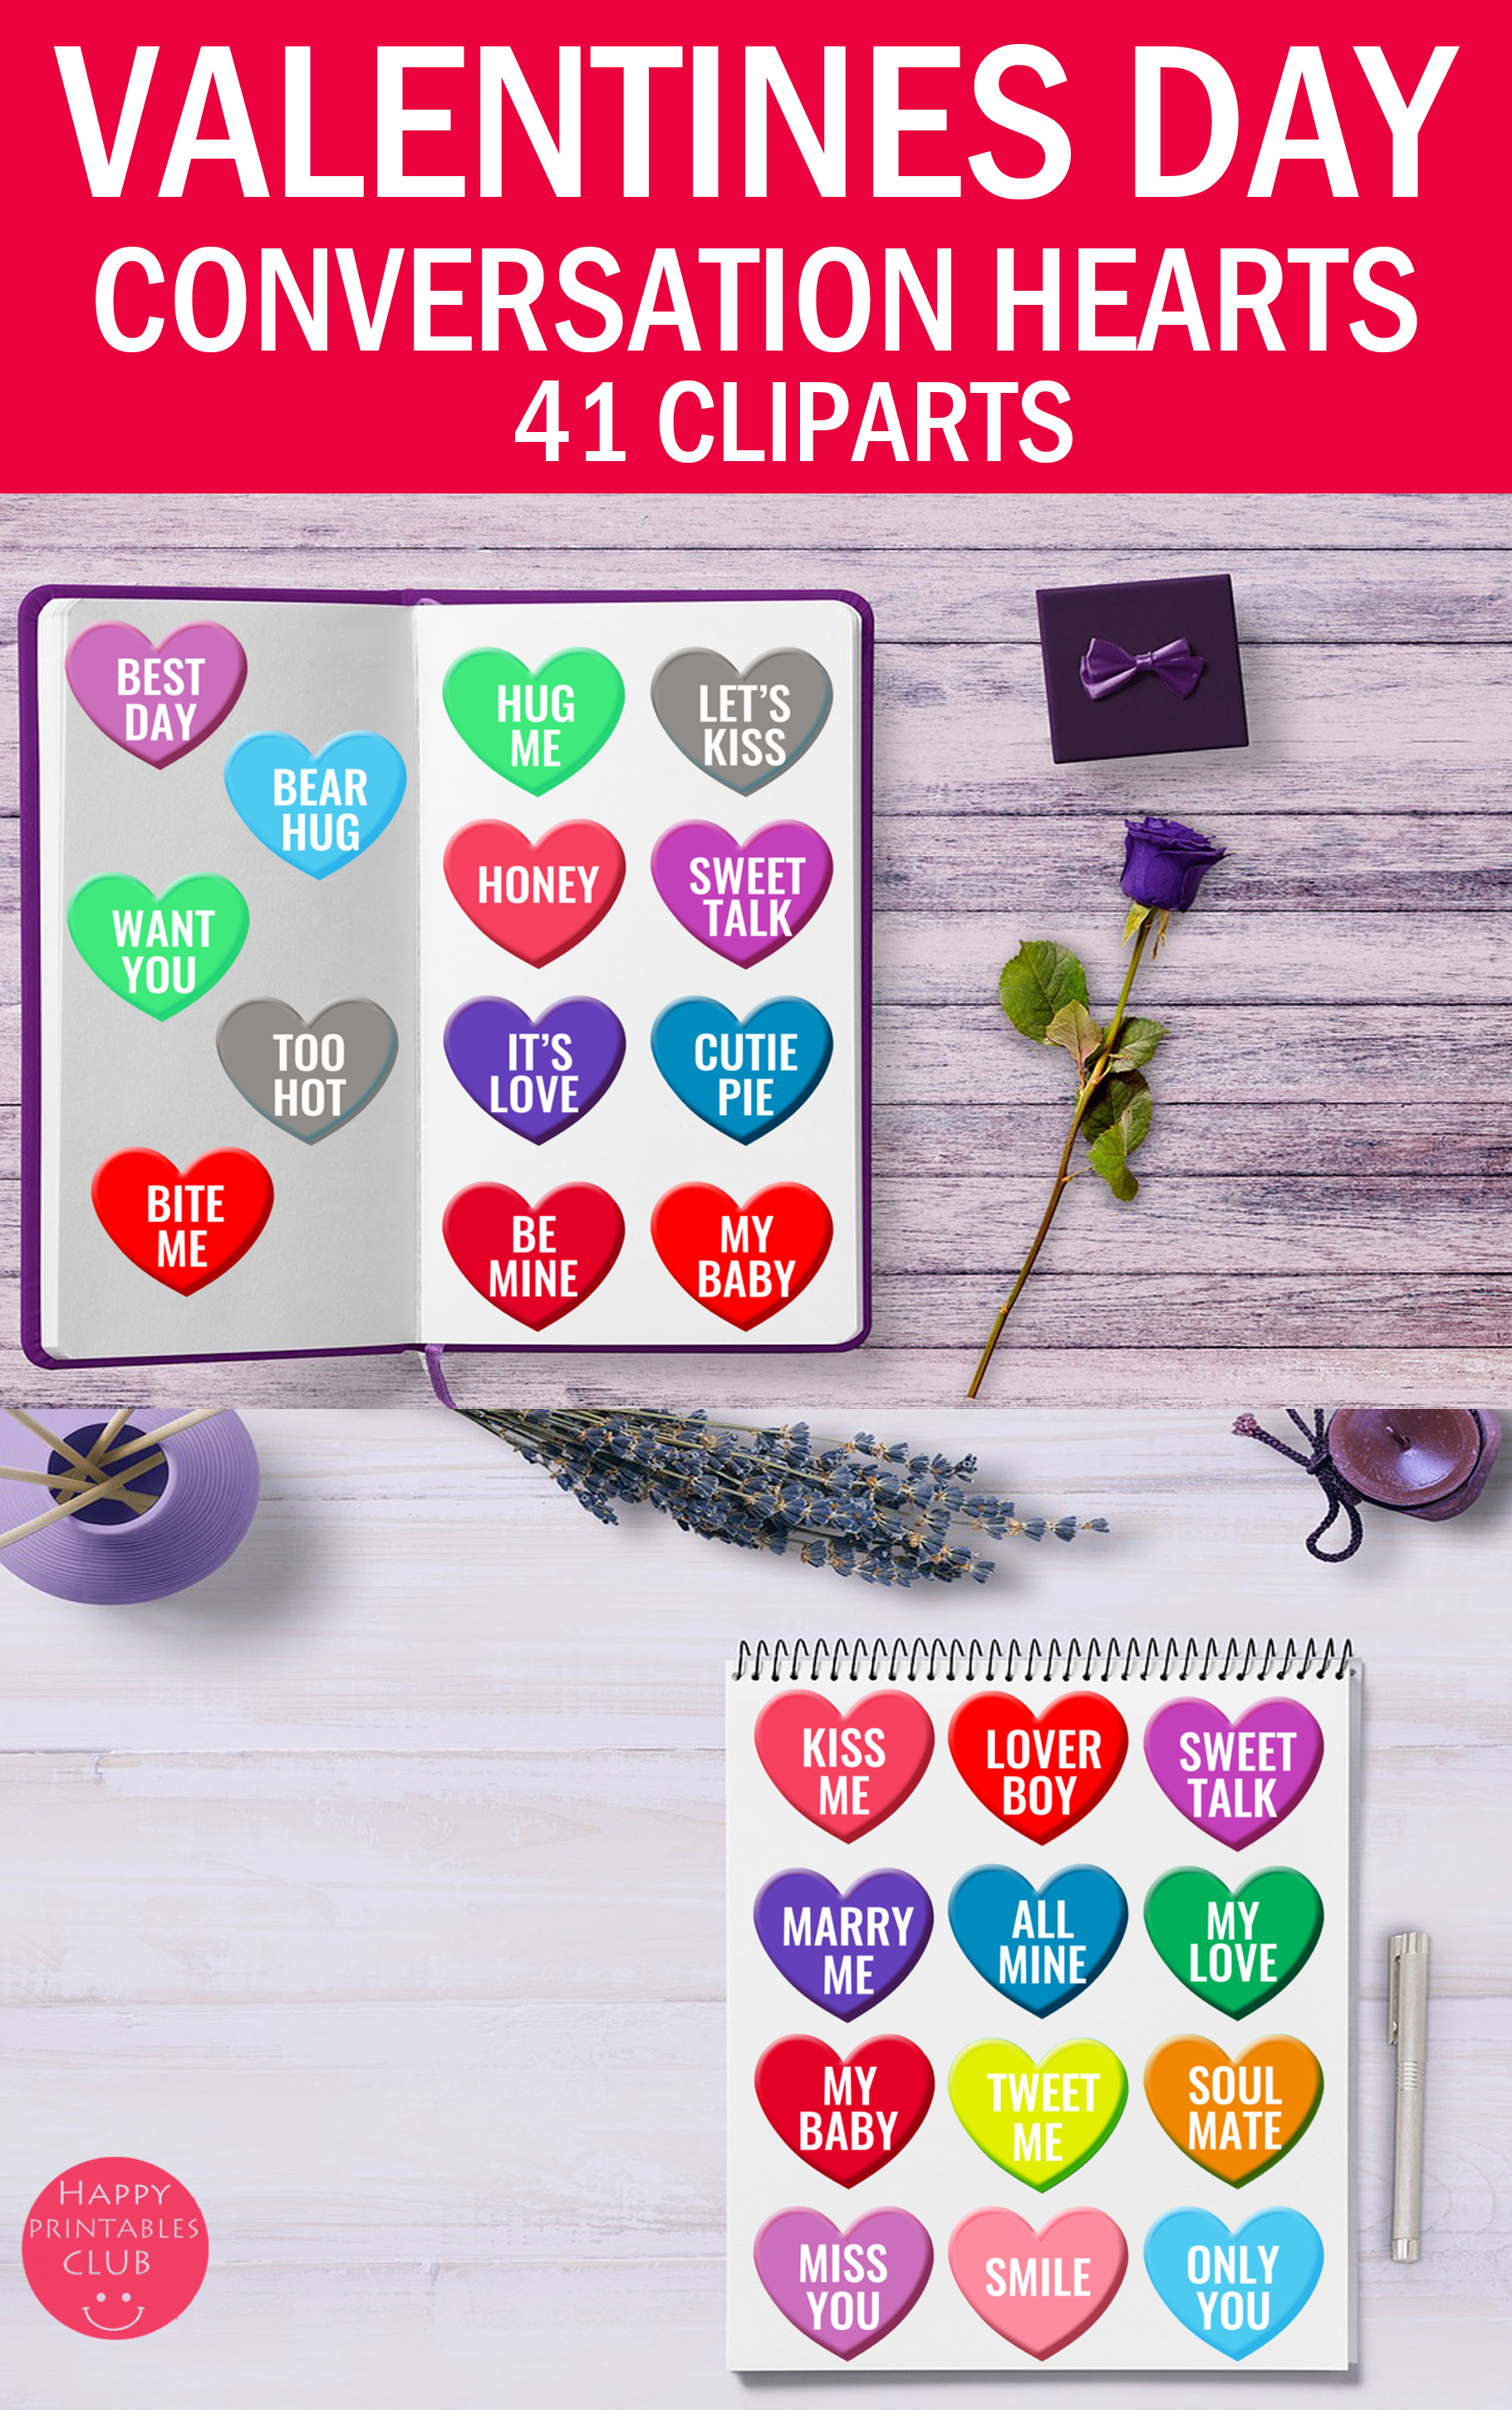 Valentine's Conversation Hearts Cliparts-Love Hearts example image 4